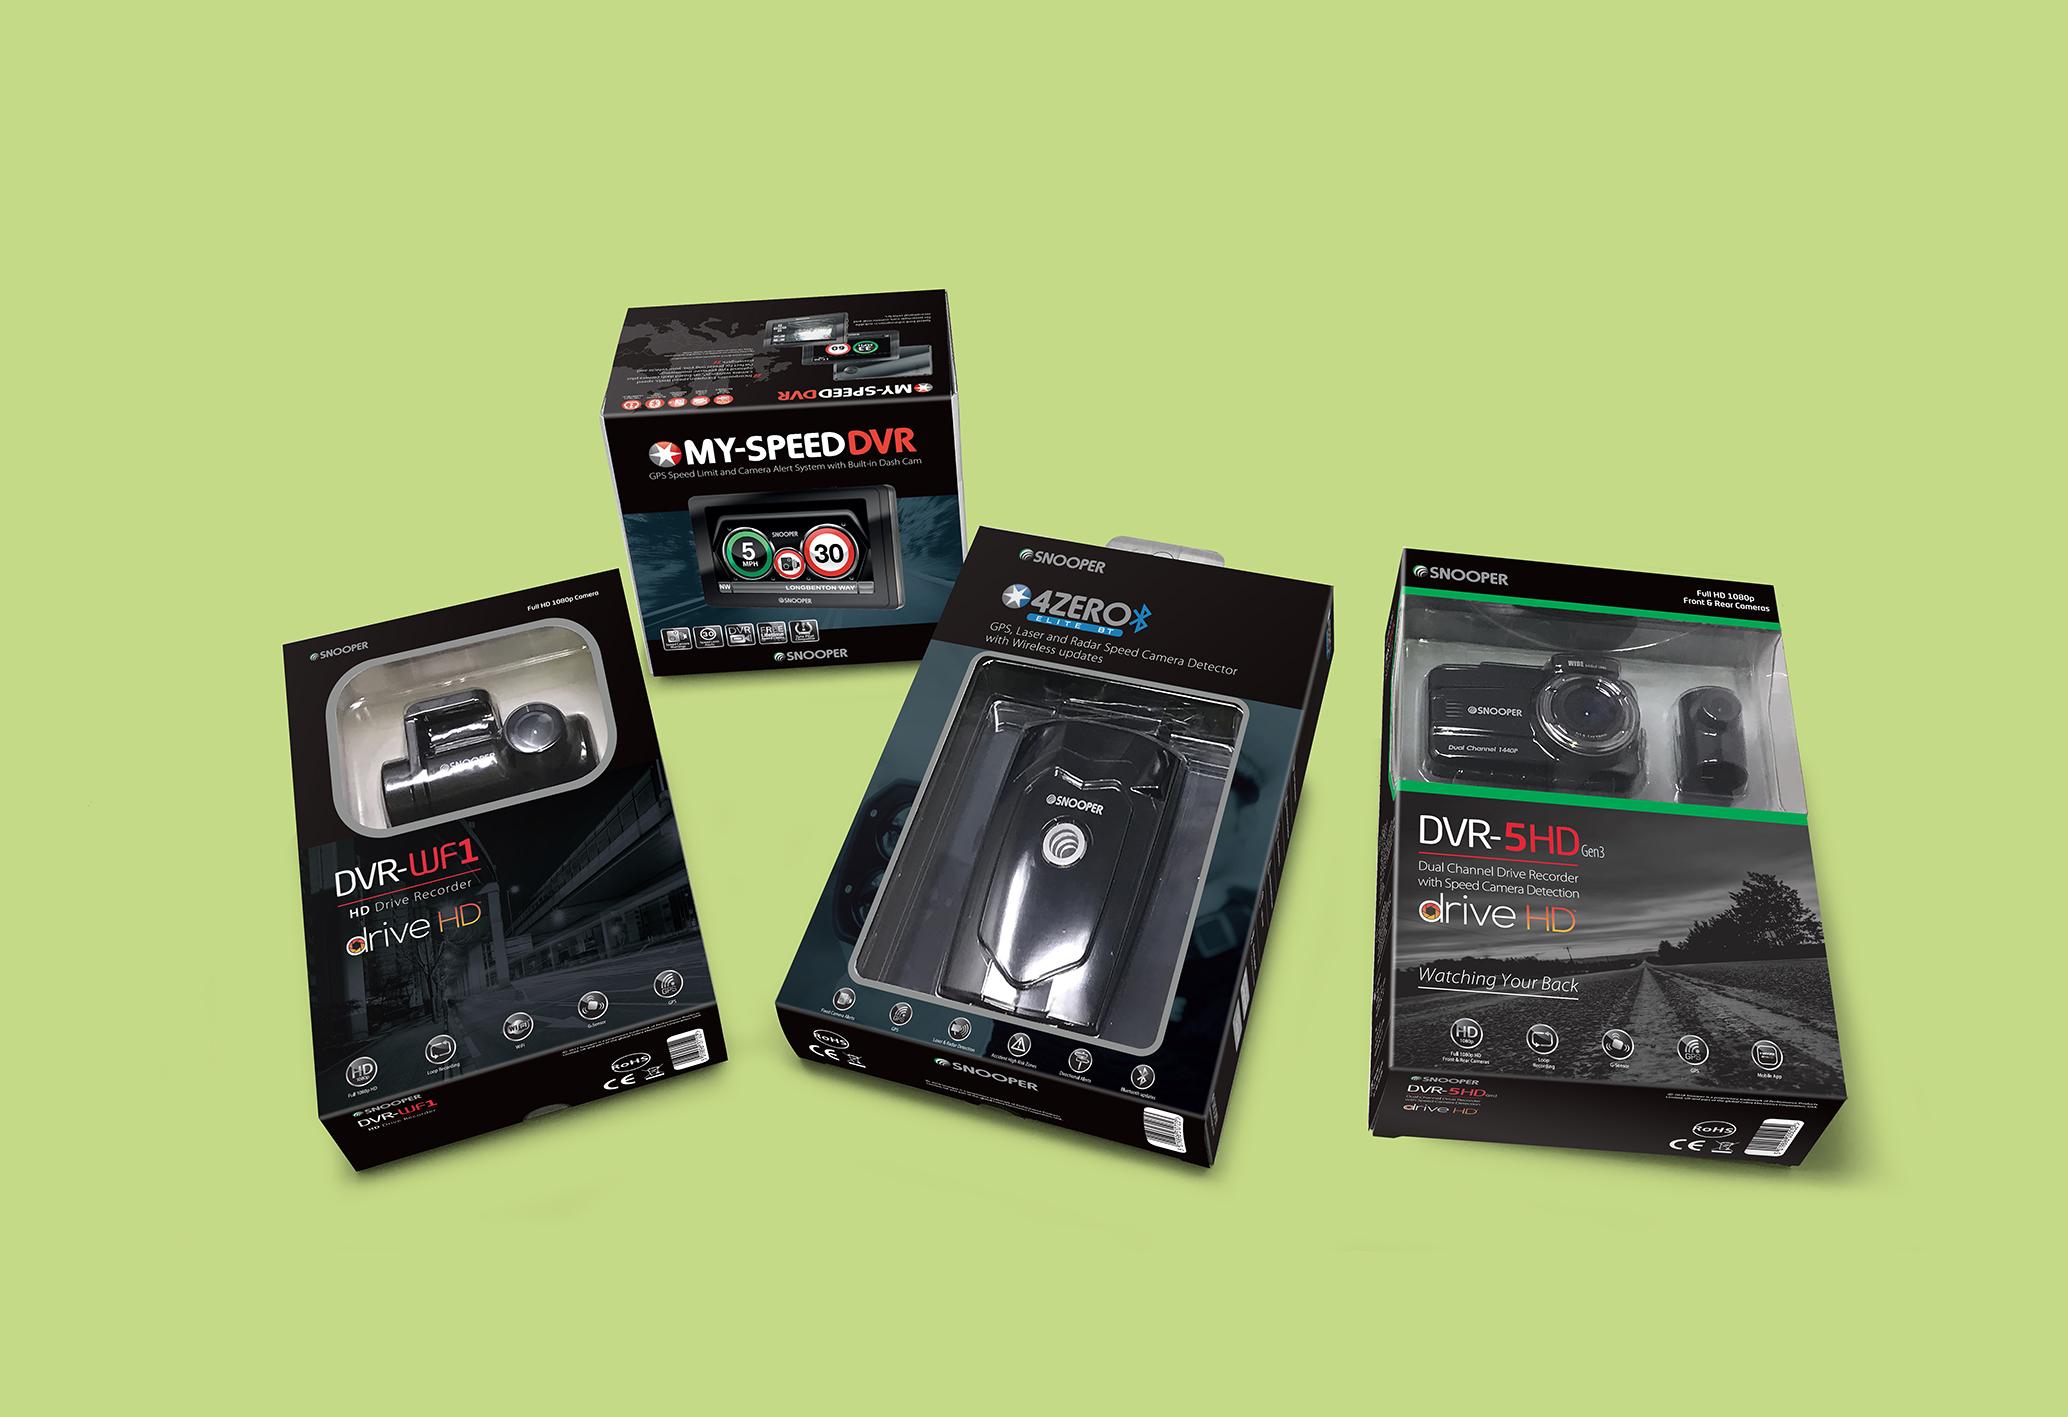 Snooper Electronics Packaging Designs